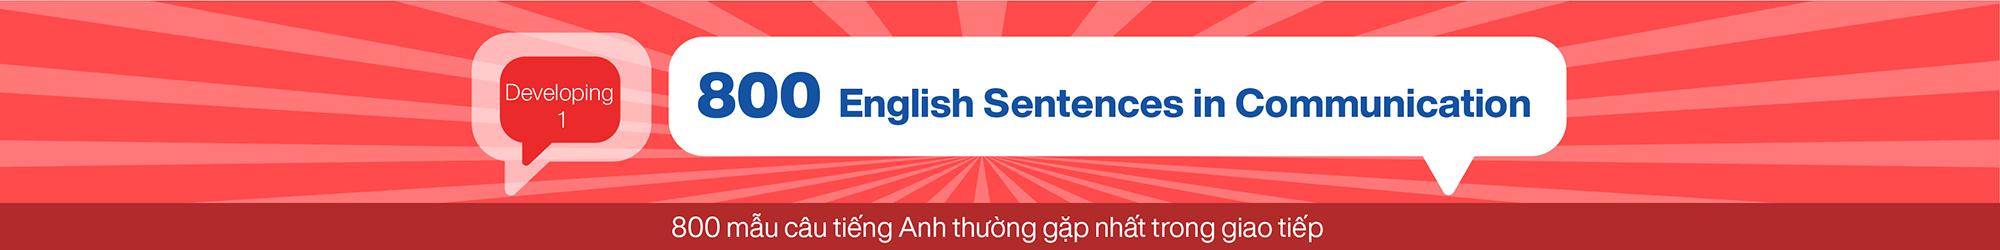 800 English Sentences in Communication (Developing 1) banner